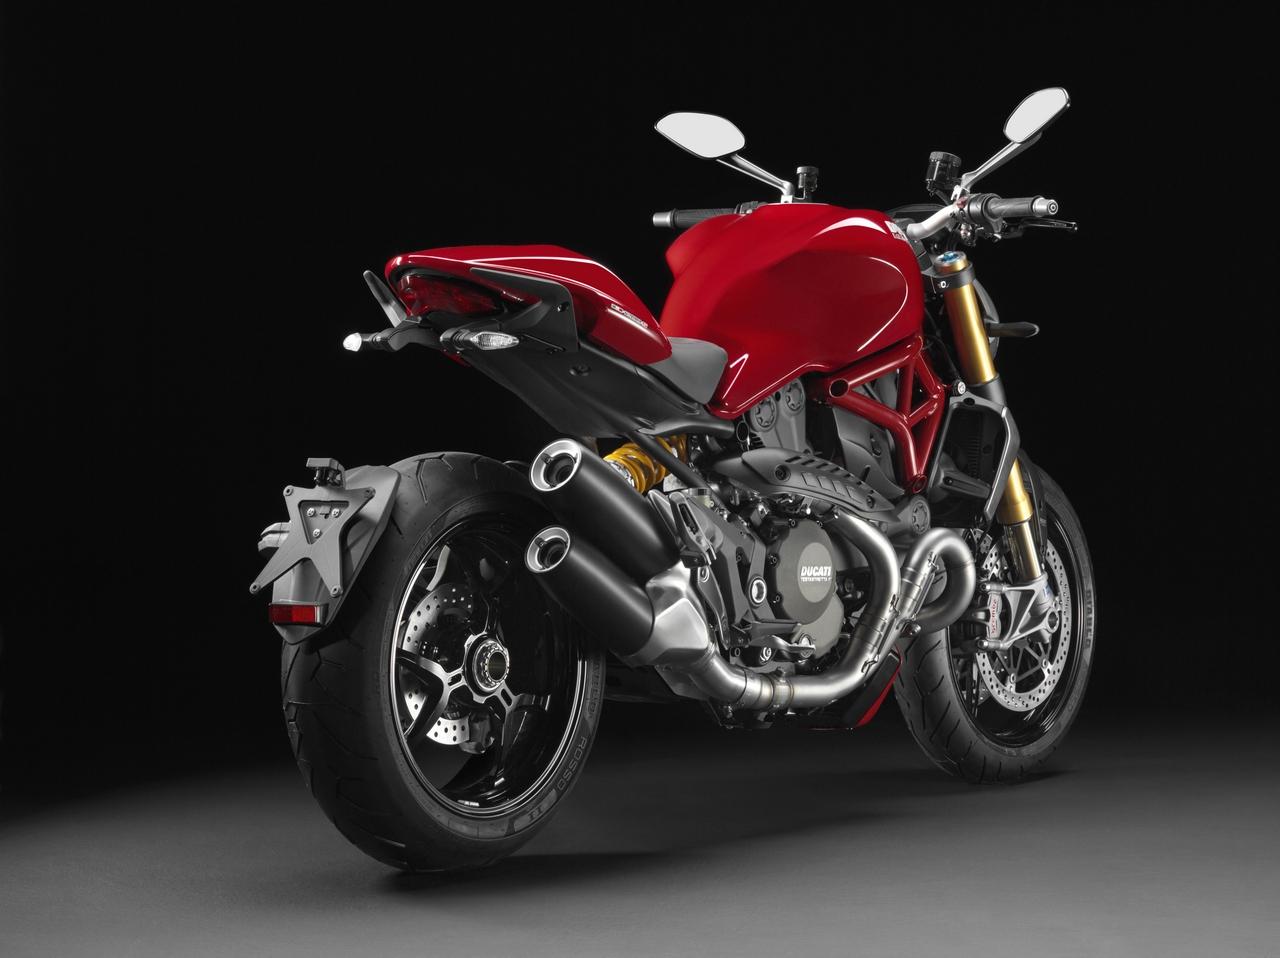 Ducati Monster - EICMA 2013